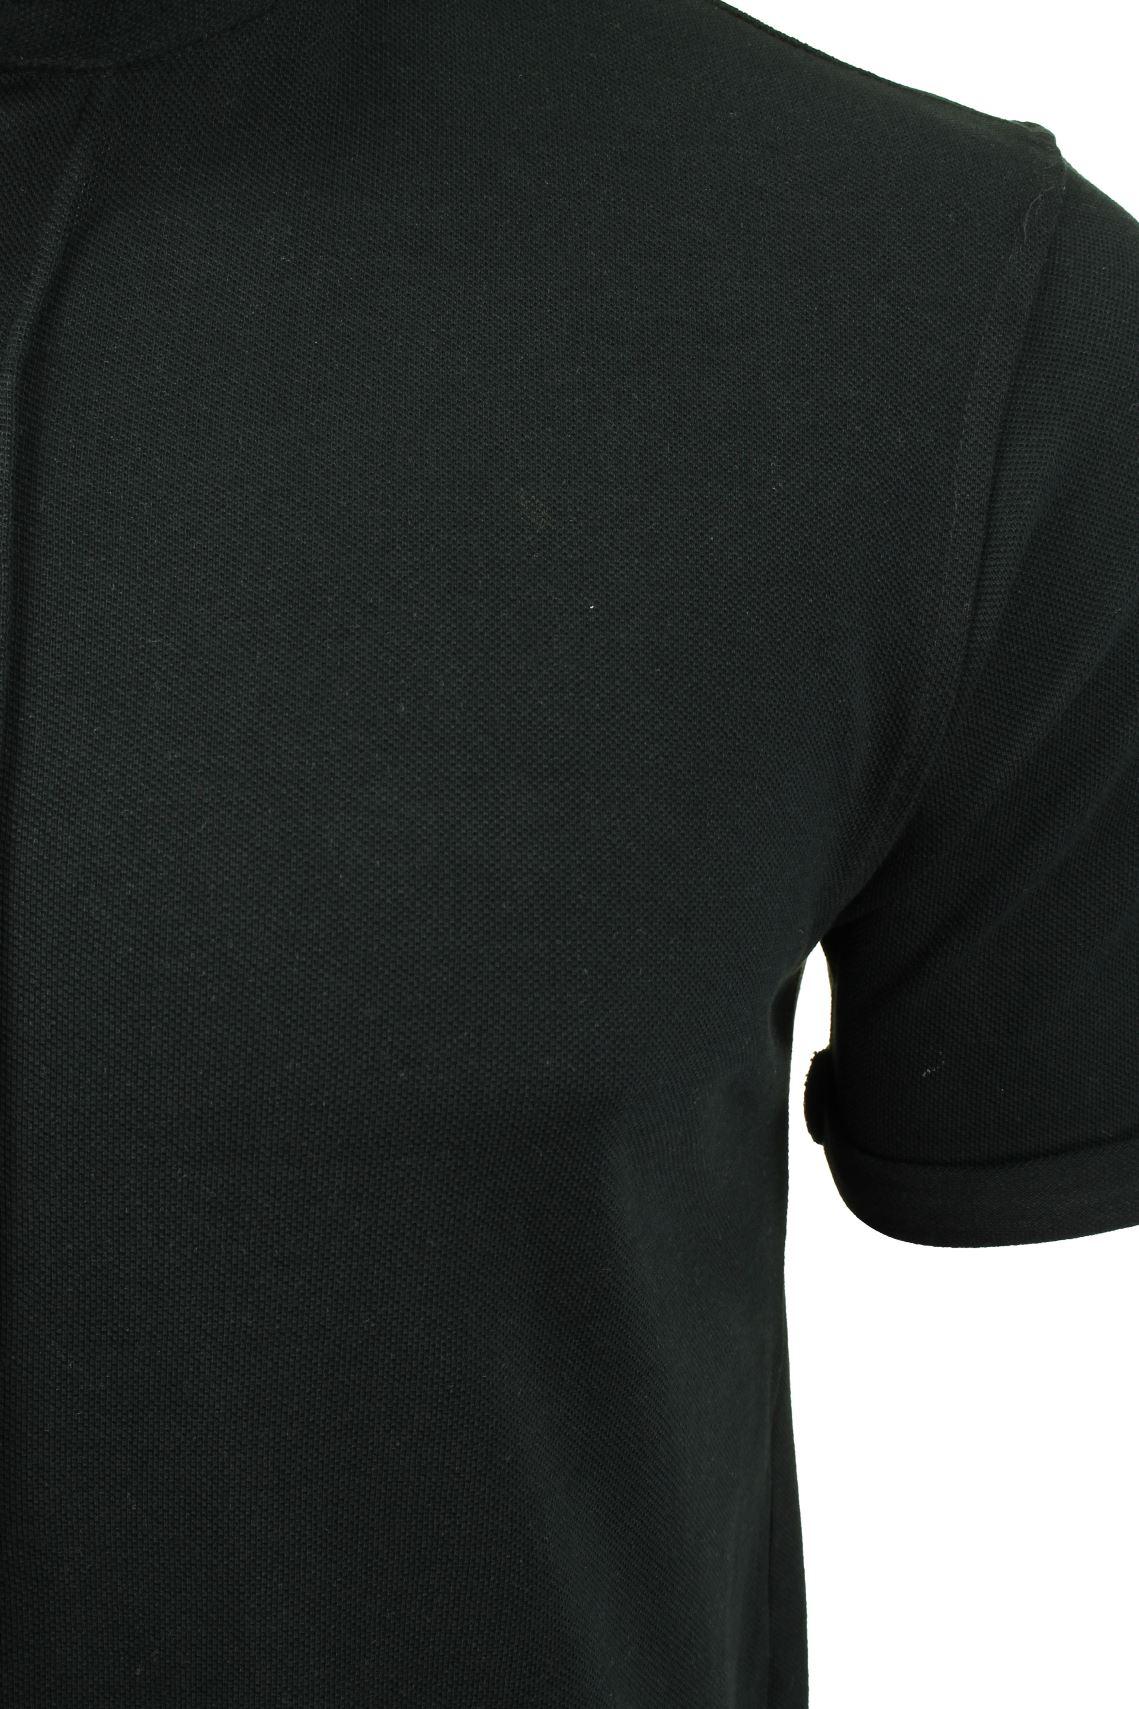 Mens-Grandad-Collar-Pique-Shirt-by-Brave-Soul-039-Joey-039 thumbnail 4